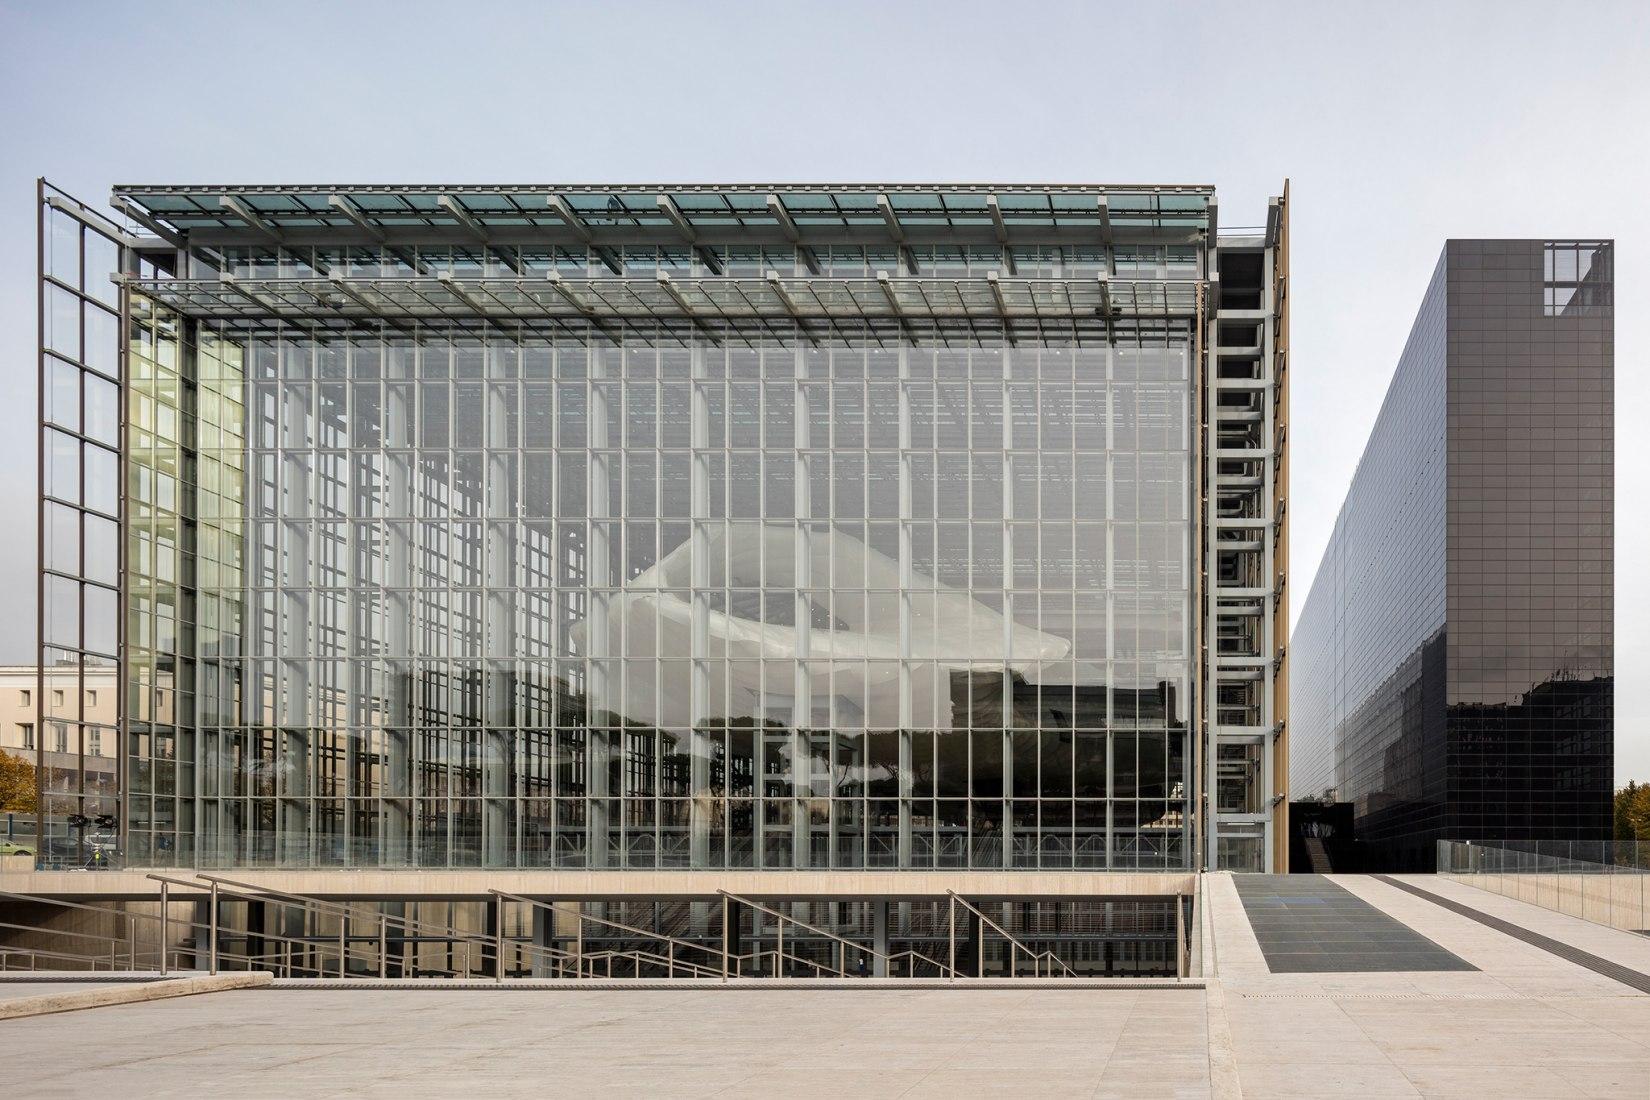 New Rome /EUR Convention Centre and Hotel 'the Cloud' by Studio Fuksas. Photograph © Leonardo Finotti